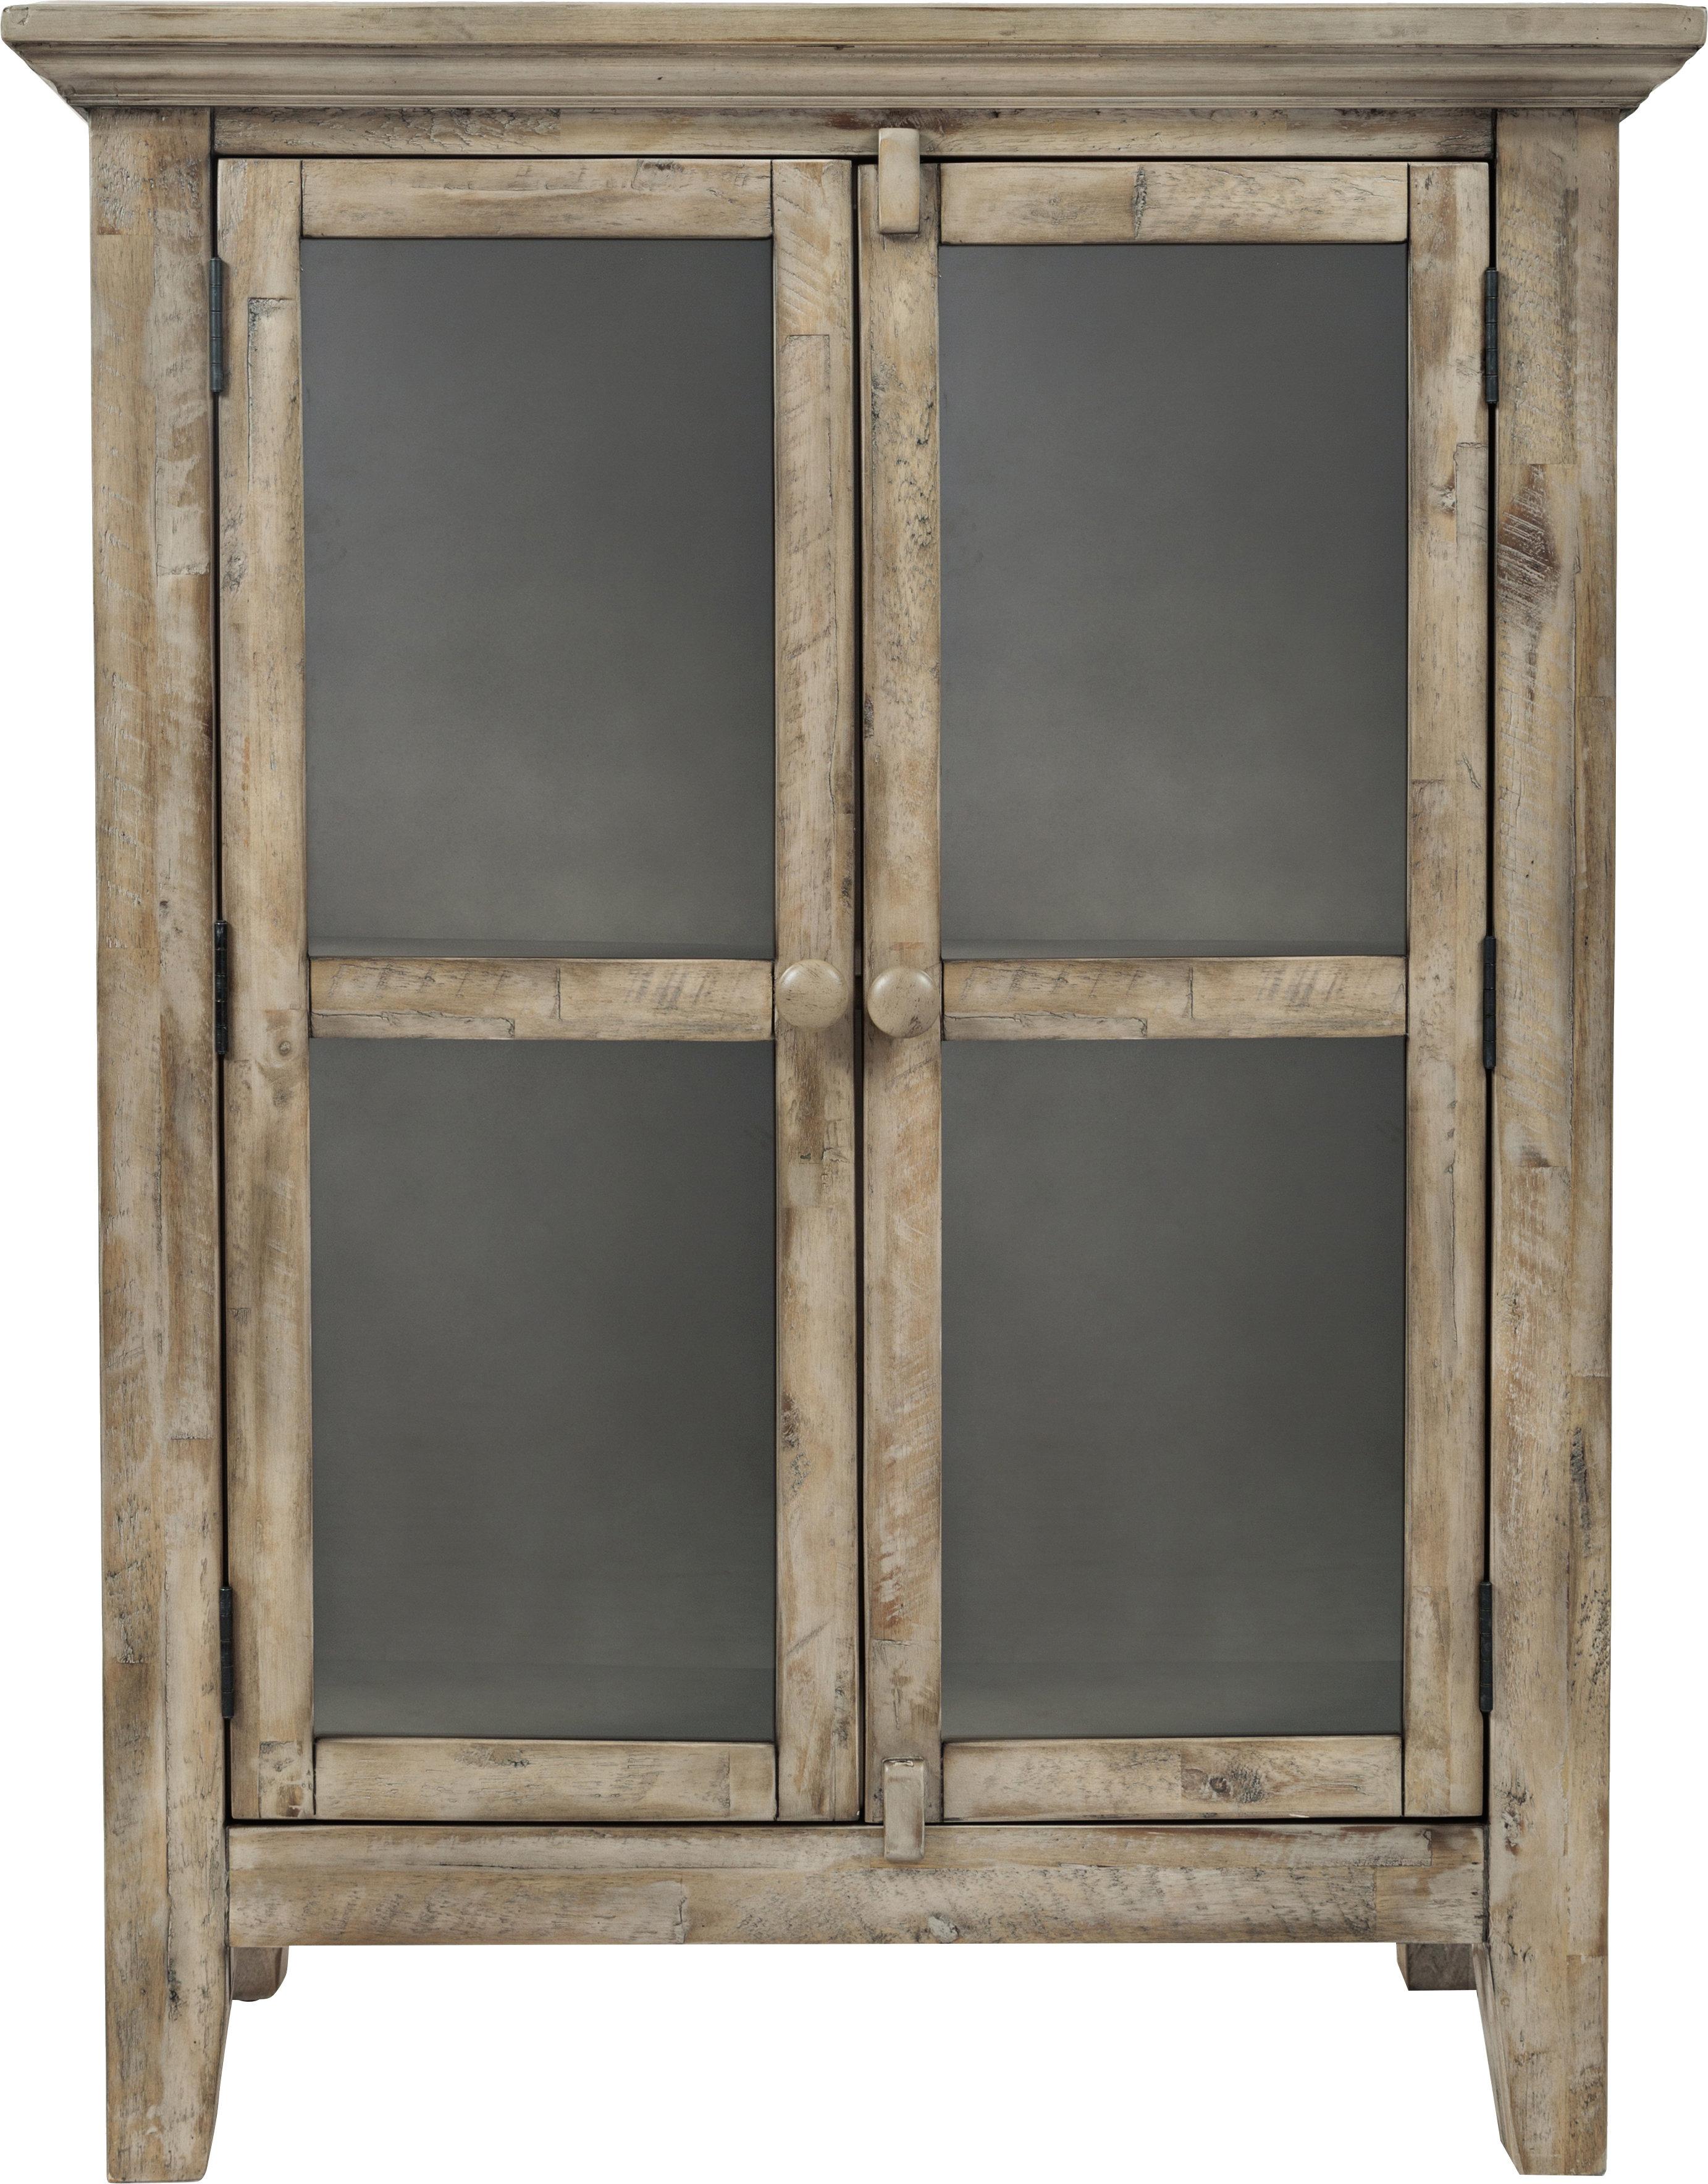 Eau Claire 2 Door Accent Cabinet for Eau Claire 6 Door Accent Cabinets (Image 6 of 30)